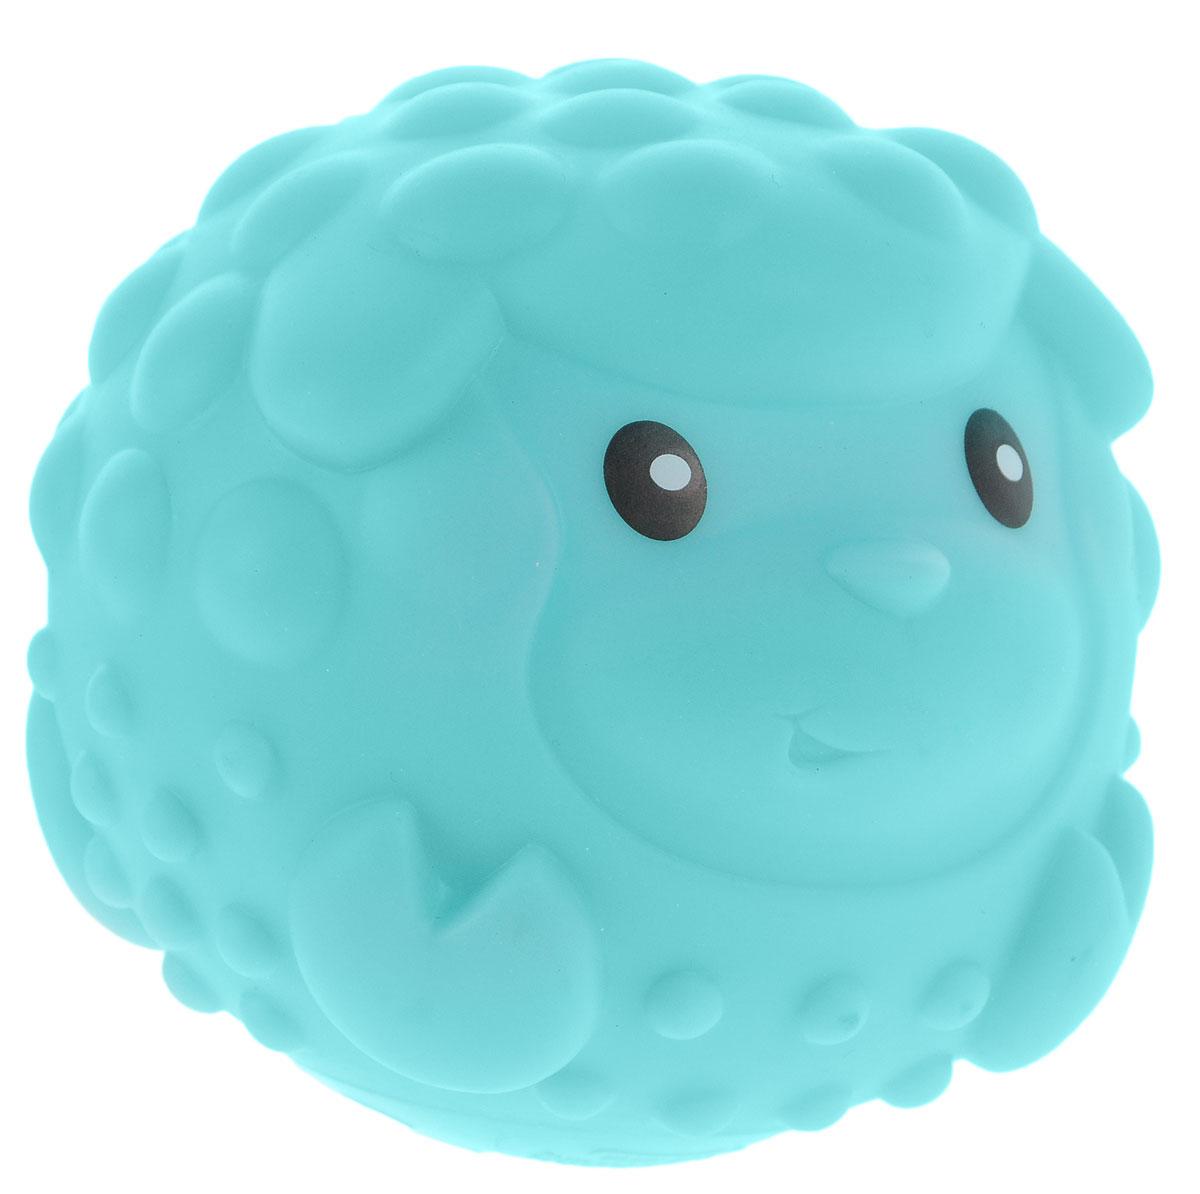 B kids Развивающая игрушка-пищалка Овечка развивающая игрушка b dot микрофон okideoki от 18 мес